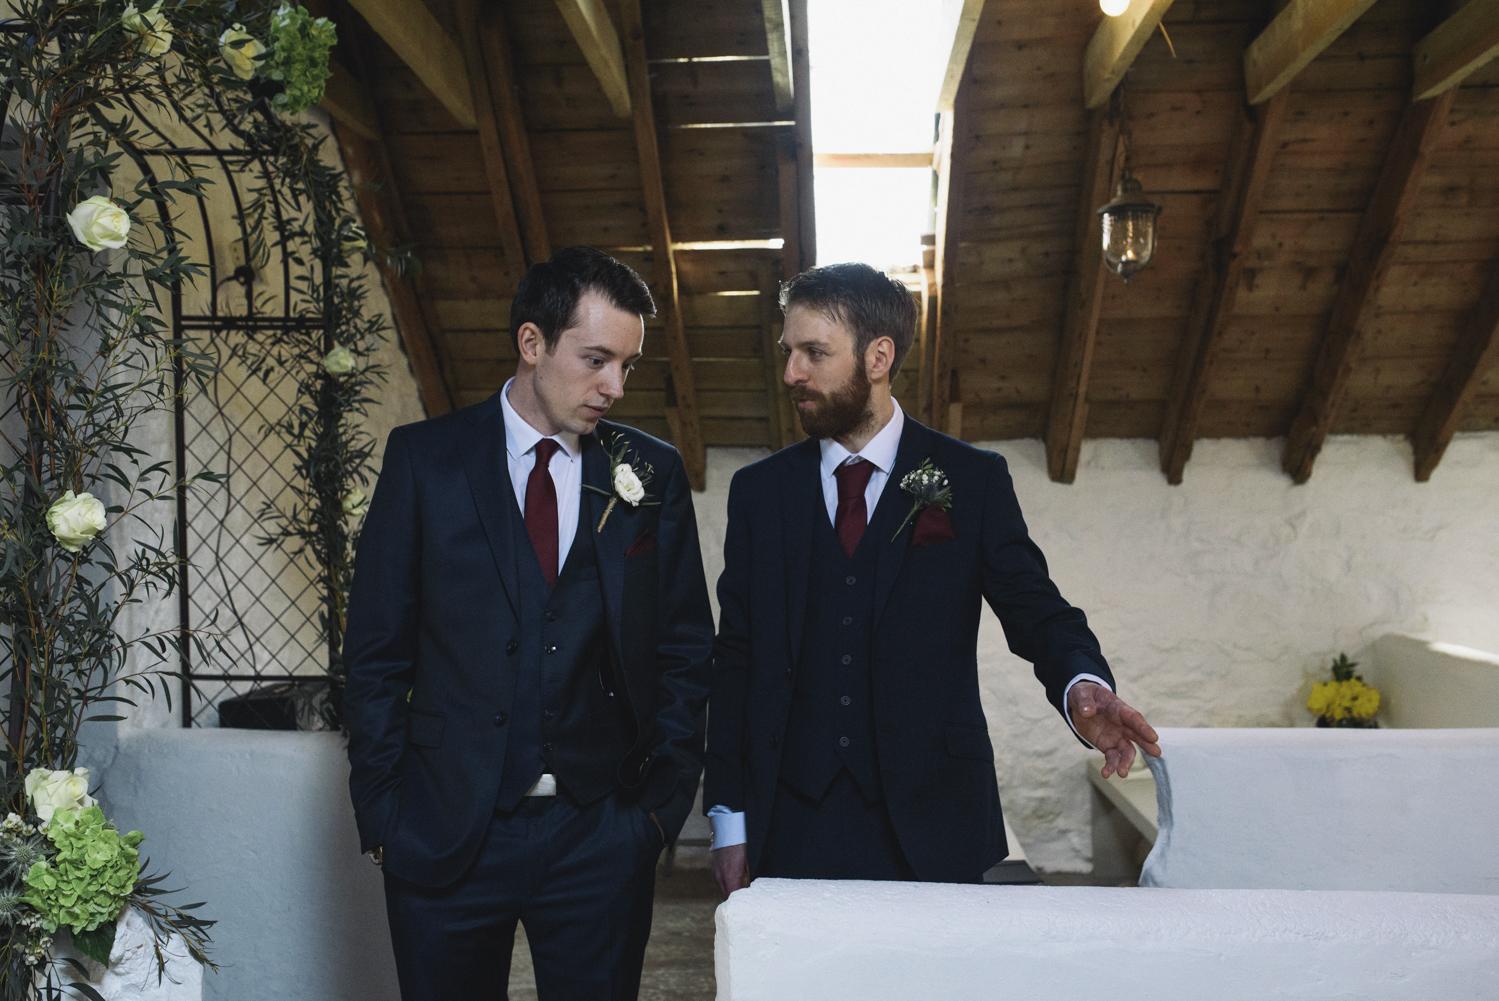 Alternative_wedding_photographer_scotland_barn_wedding_knockraich-20.jpg